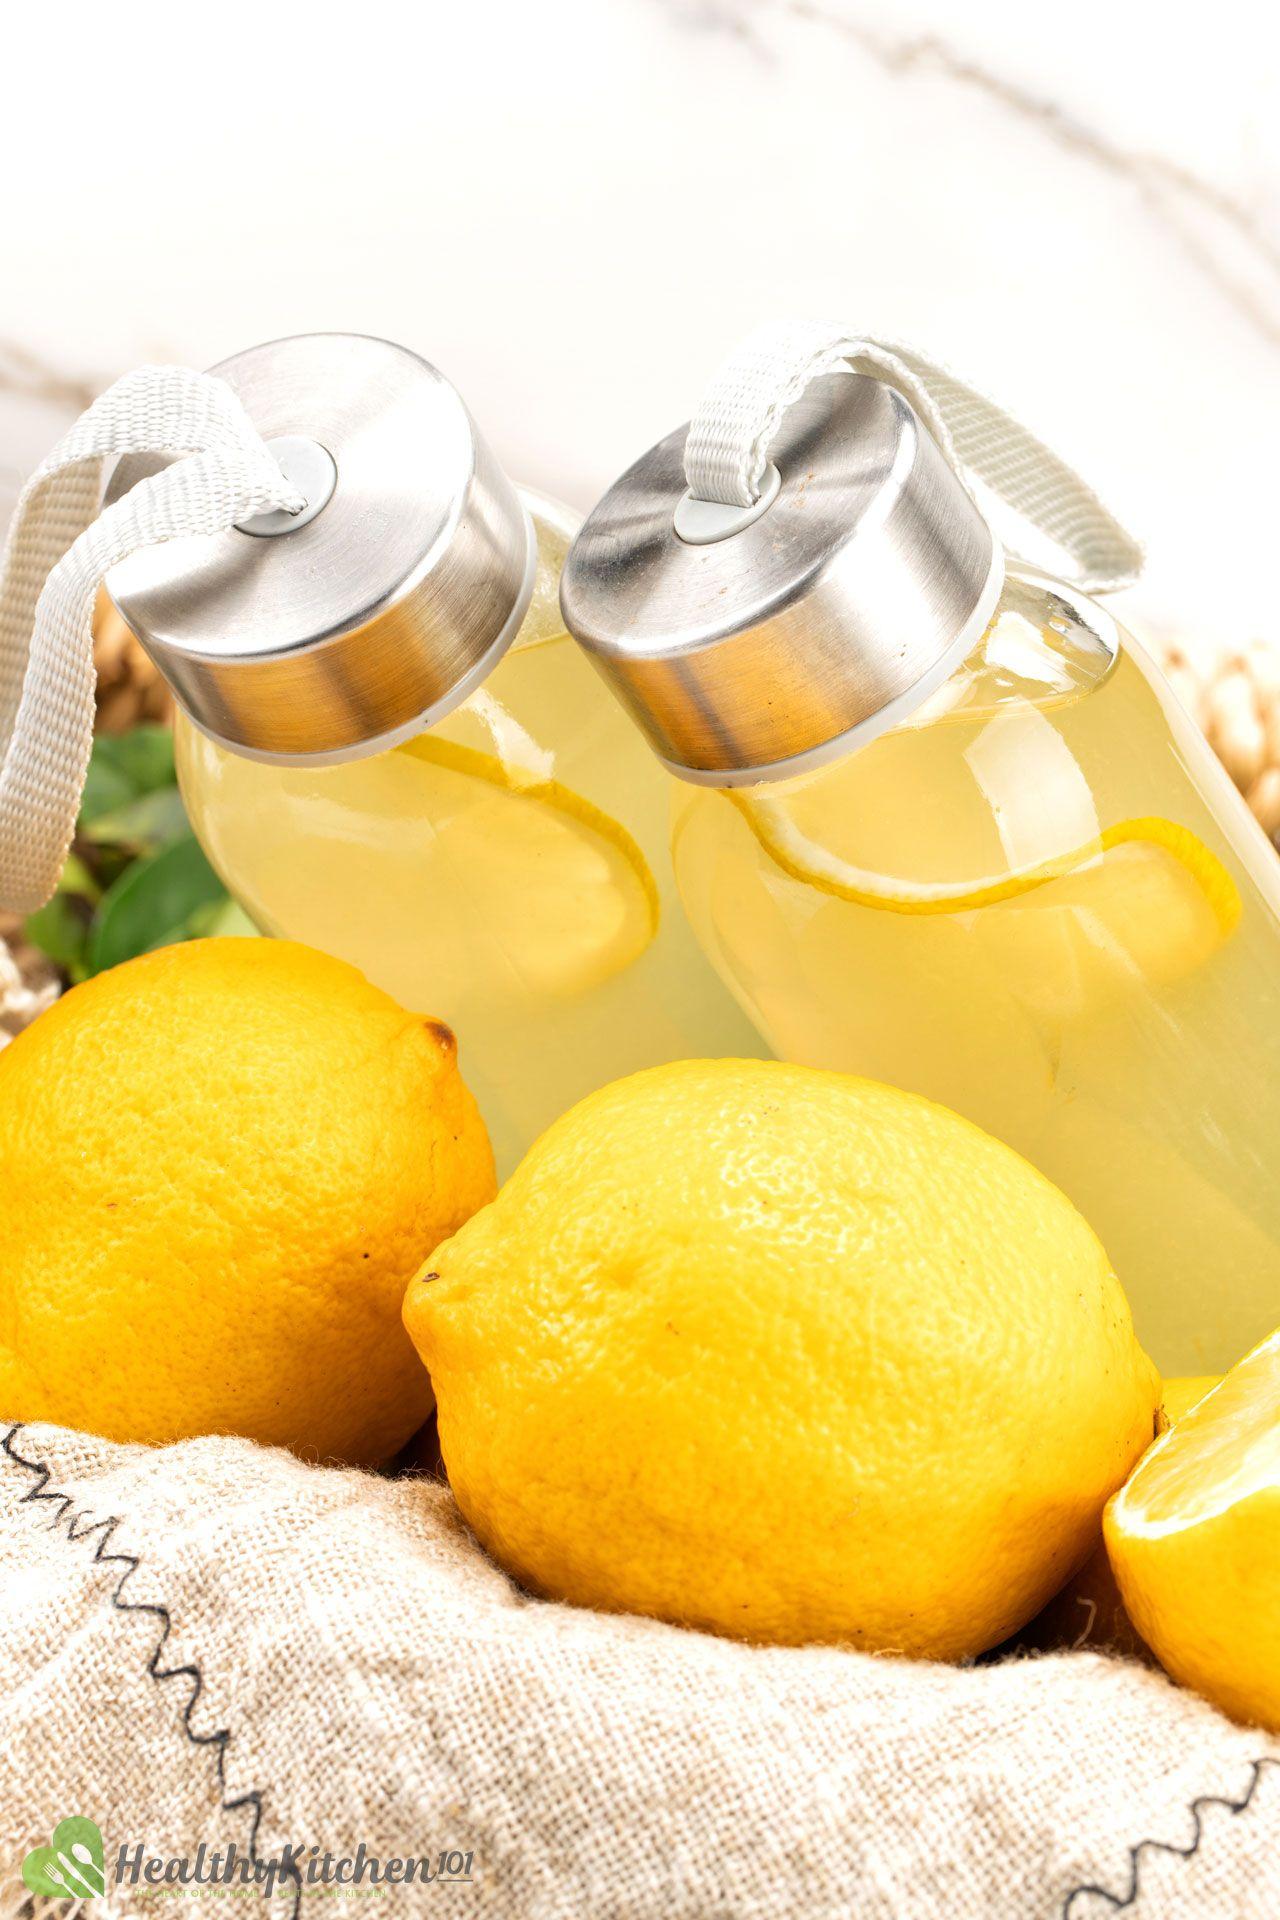 How to Make Lemonade With Lemon Juice